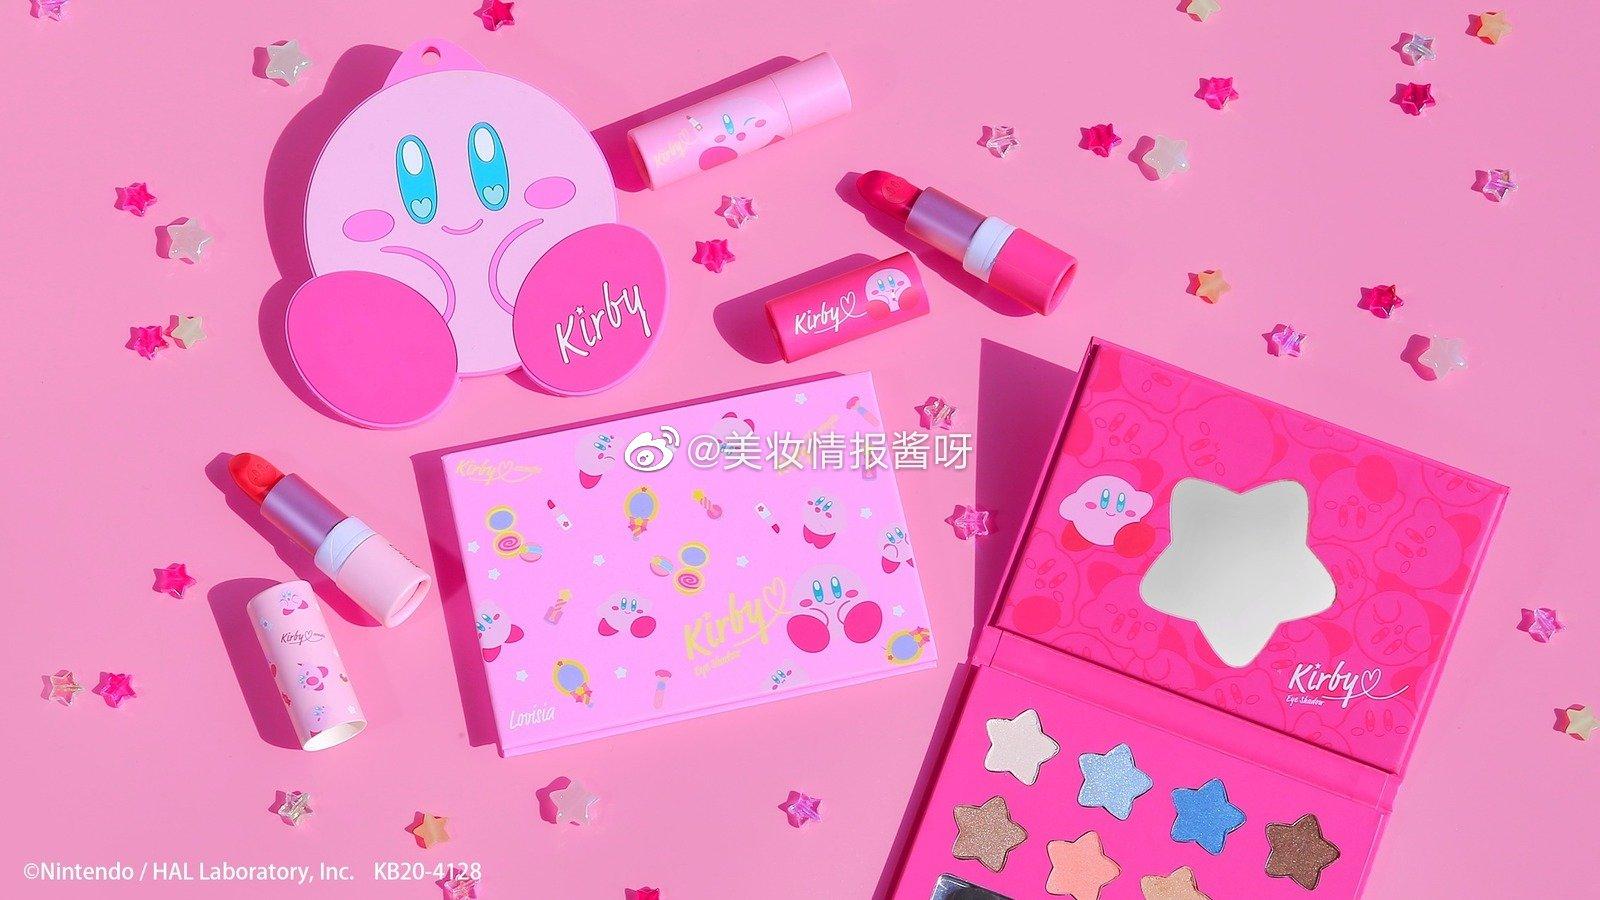 Kirby's Dream Land 系列彩妆3月28日开始发售